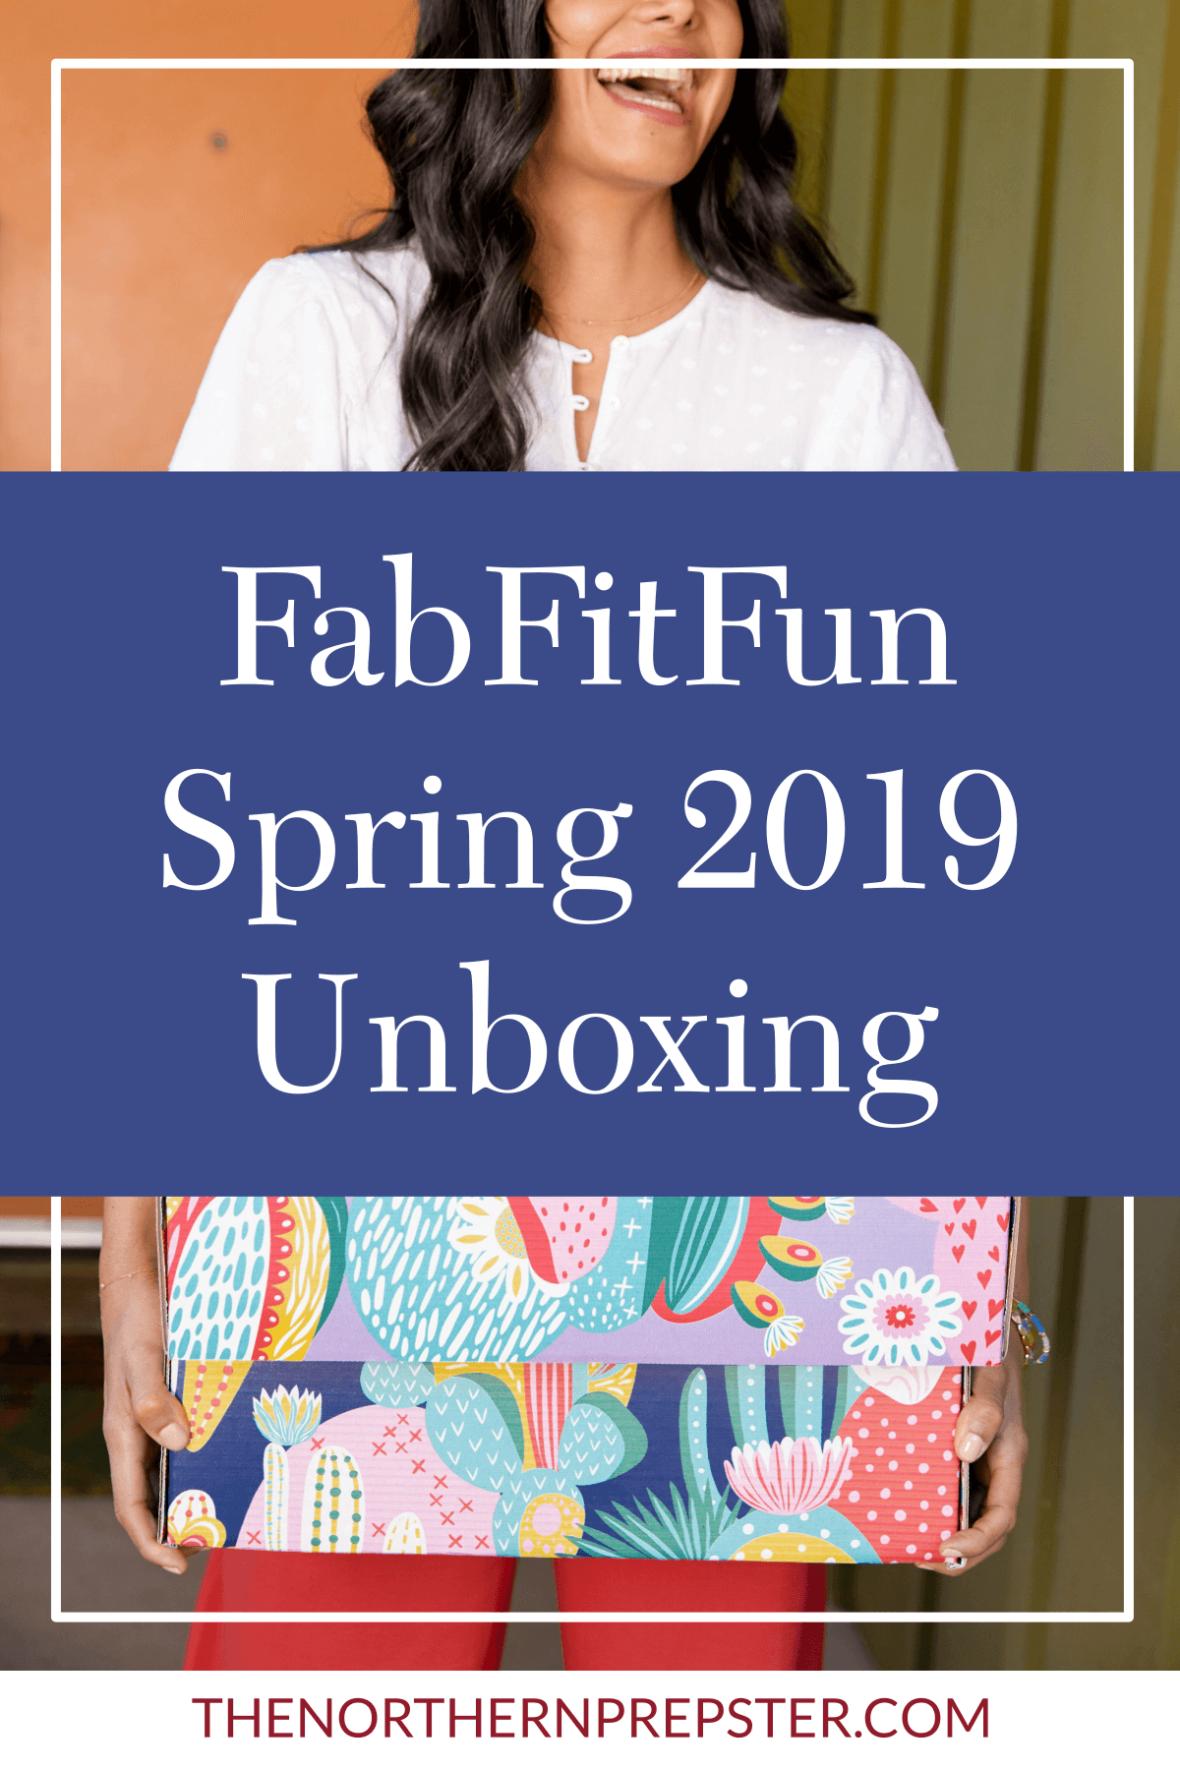 What I Got in My Spring 2019 FabFitFun Box + COUPON CODE